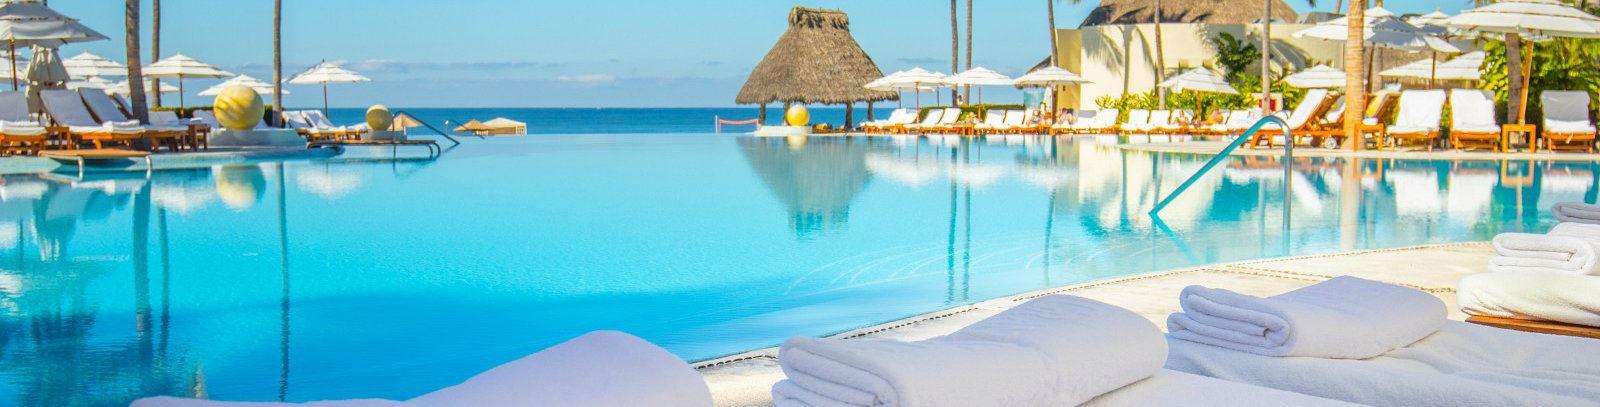 Grand Velas Riviera Nayarit offering Bachelorette Package